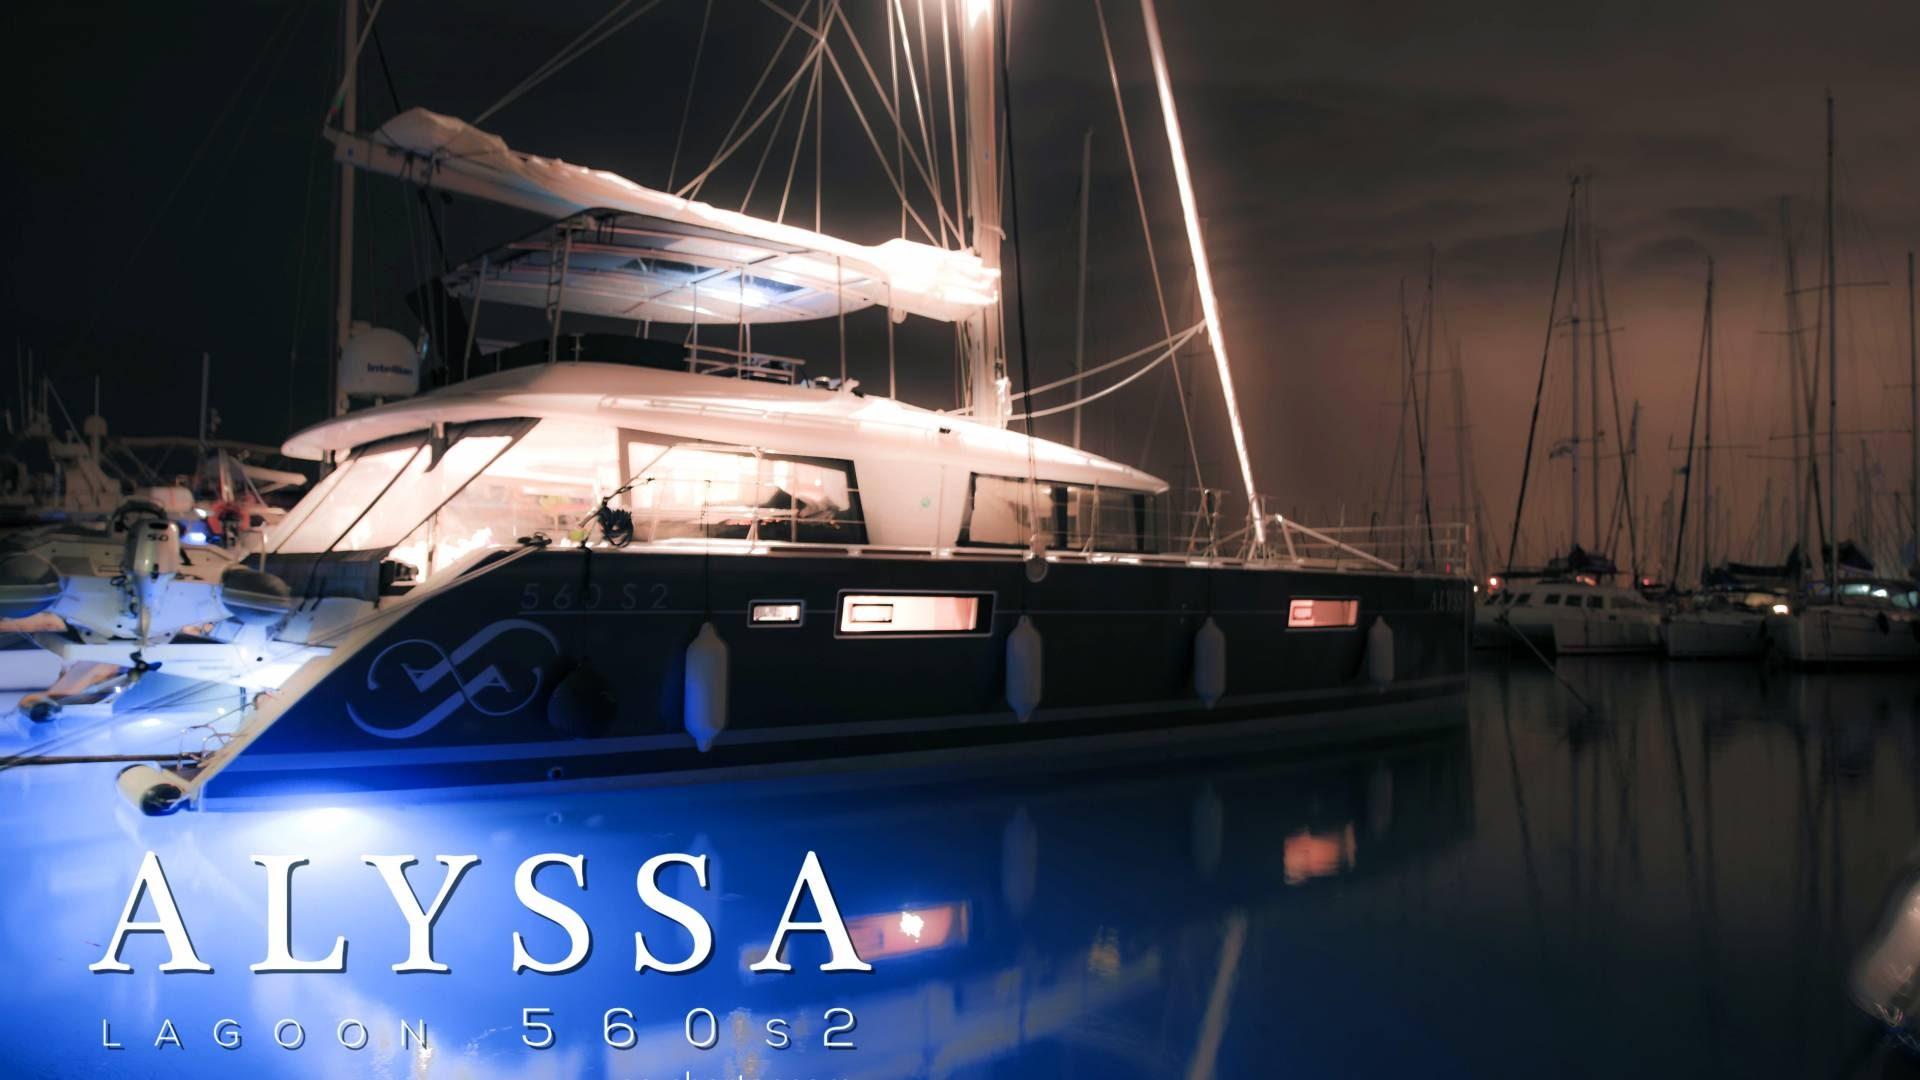 alyssa-lagoon-athens-greece-l.jpg